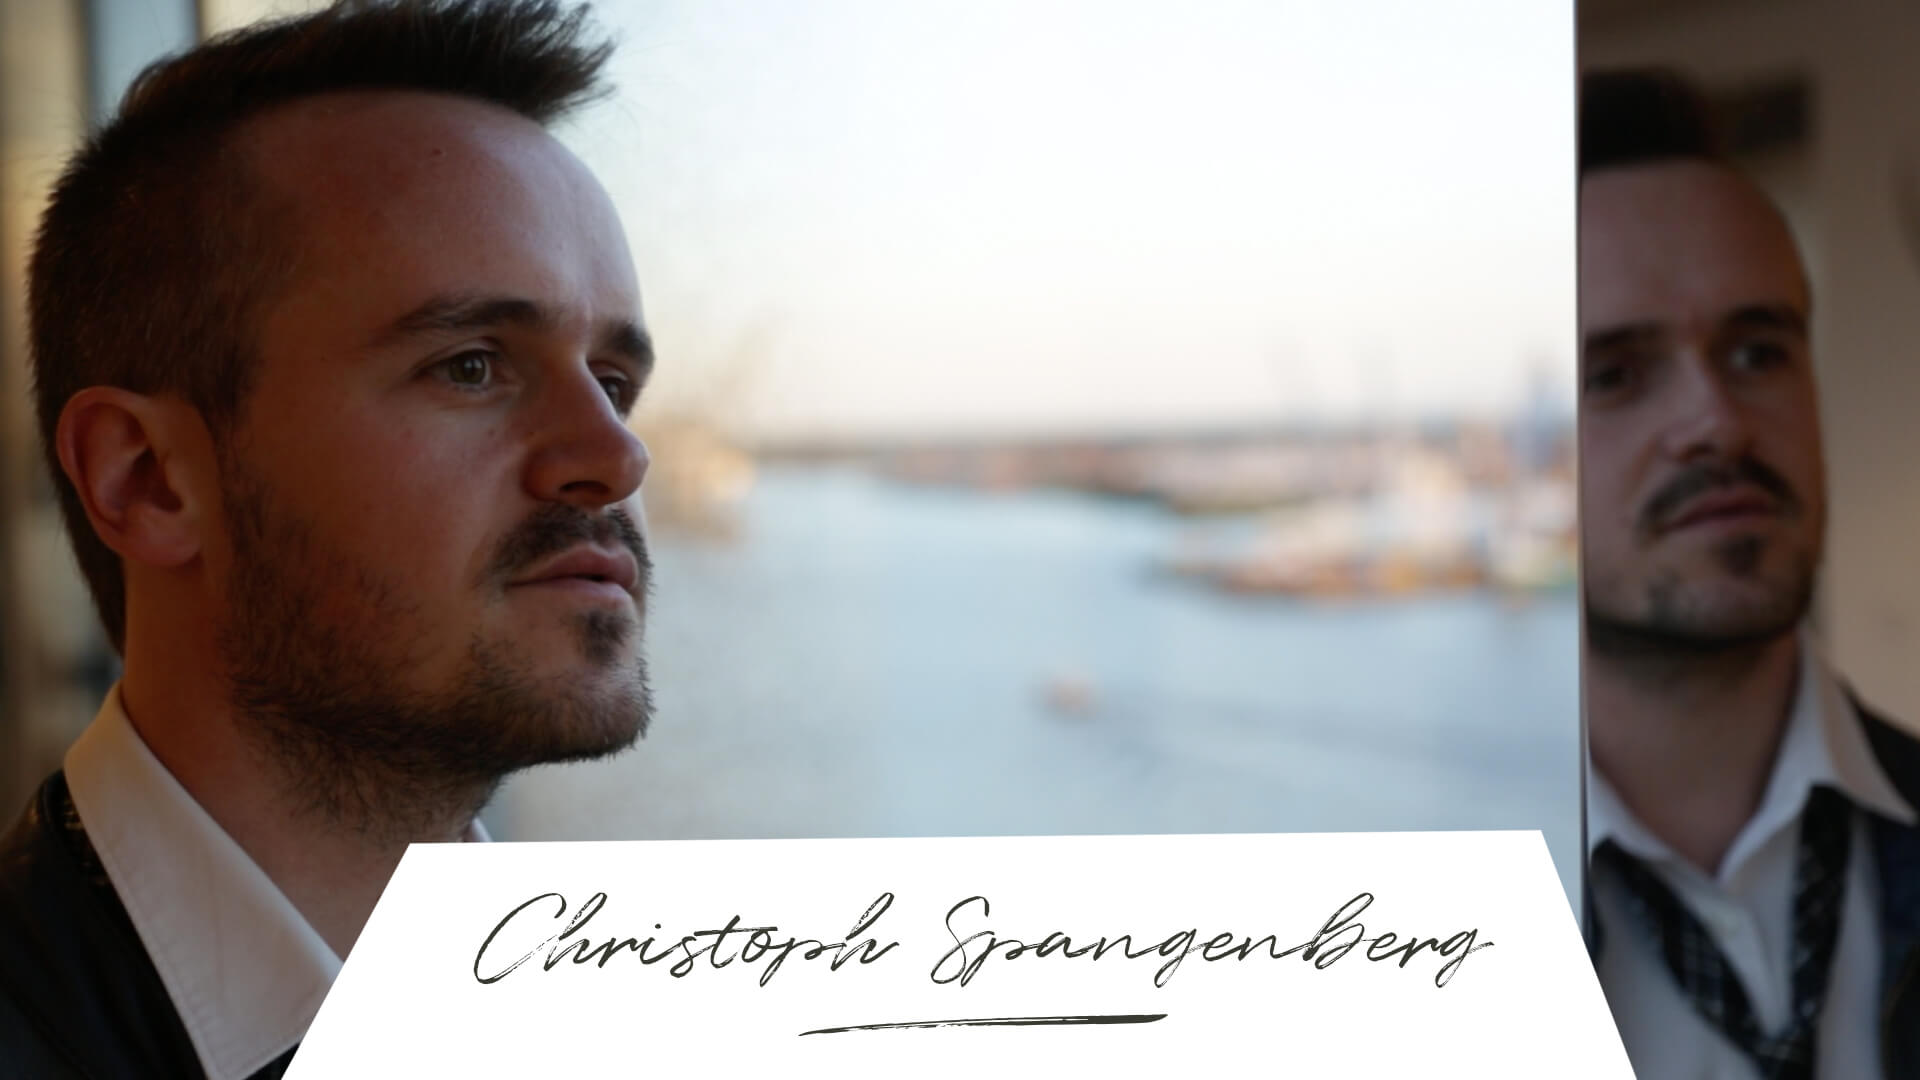 Where is now? Christoph Spangenberg Wegbegleiter